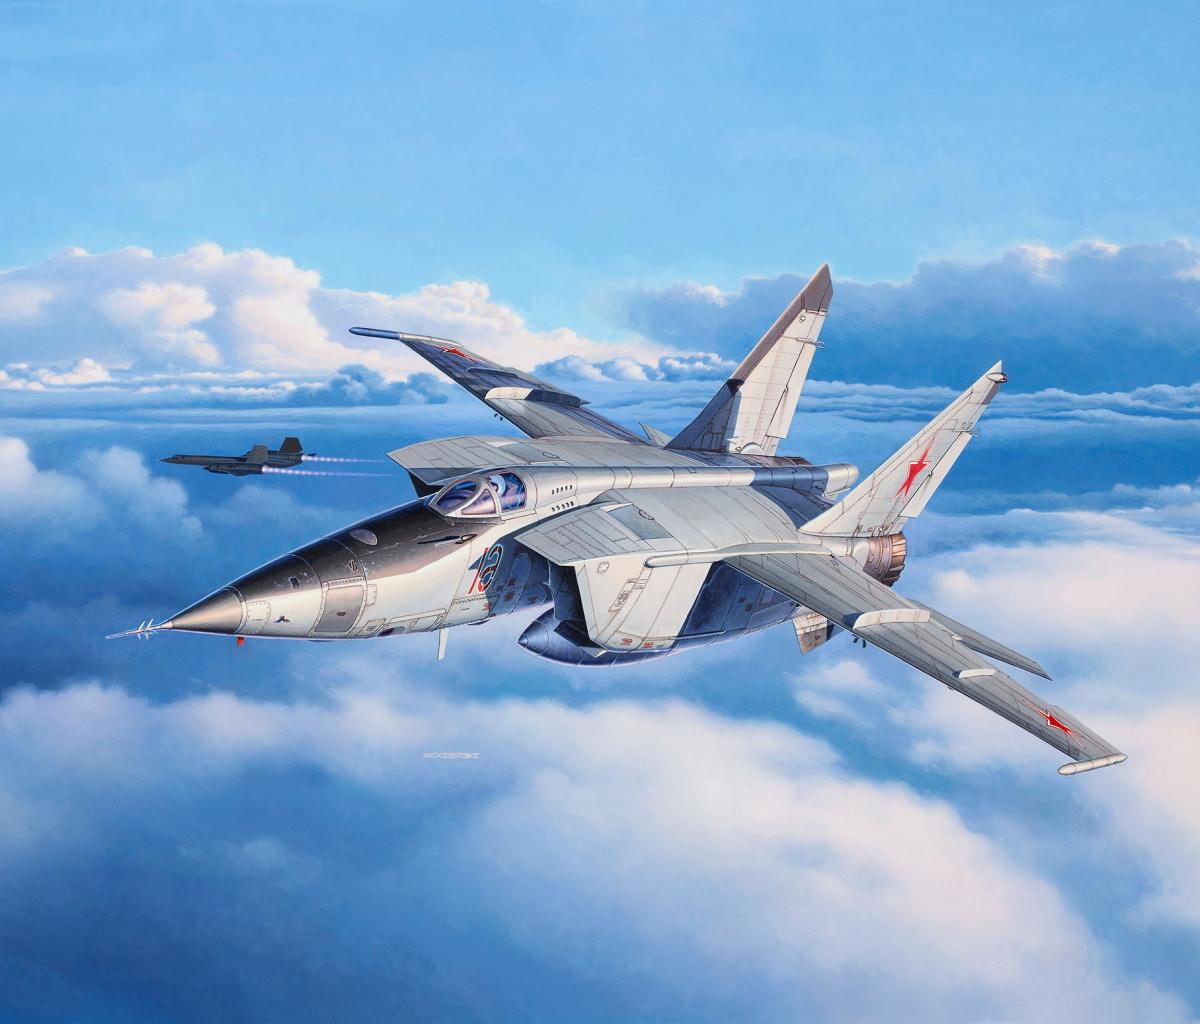 MilitaryMikoyan Gurevich MiG 25 1200x1024 Wallpaper ID 819486 1200x1024